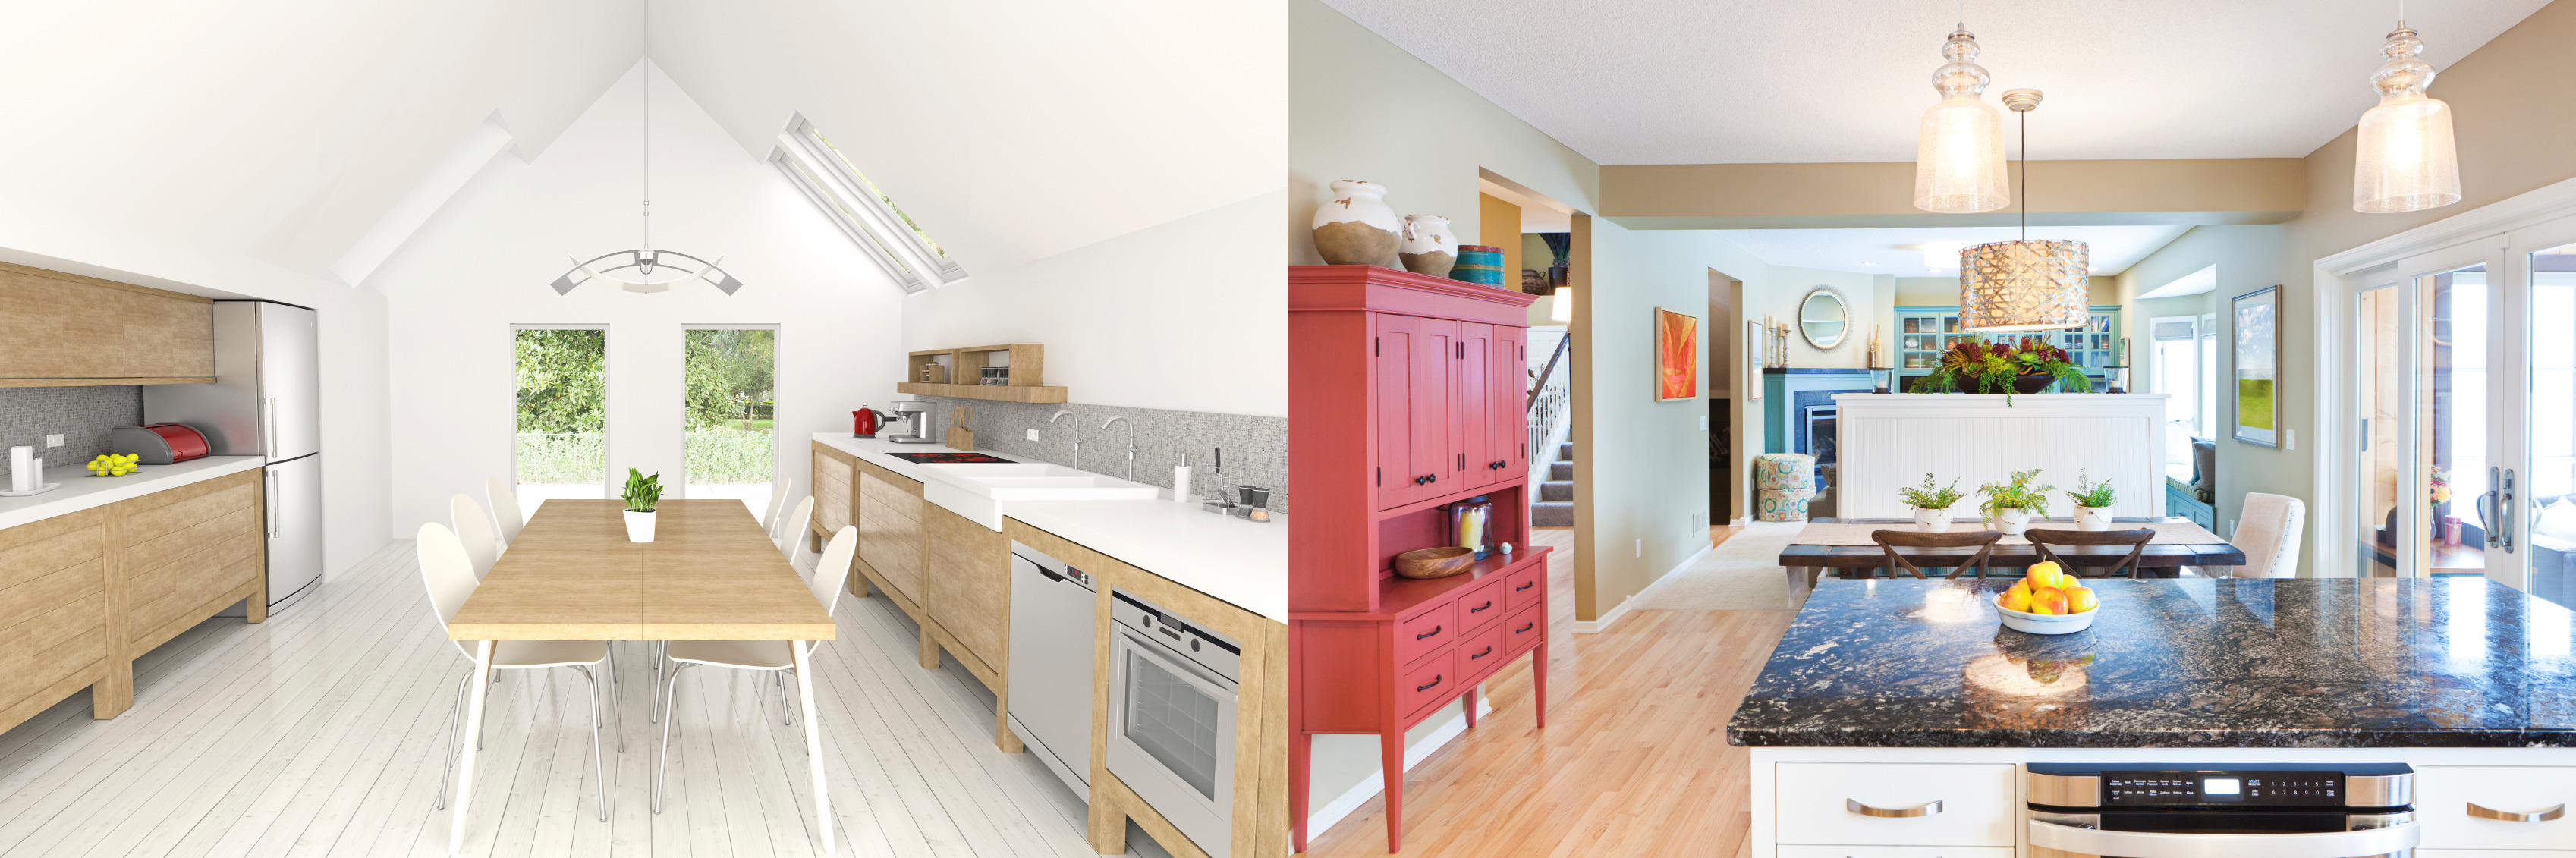 Choosing a kitchen floor